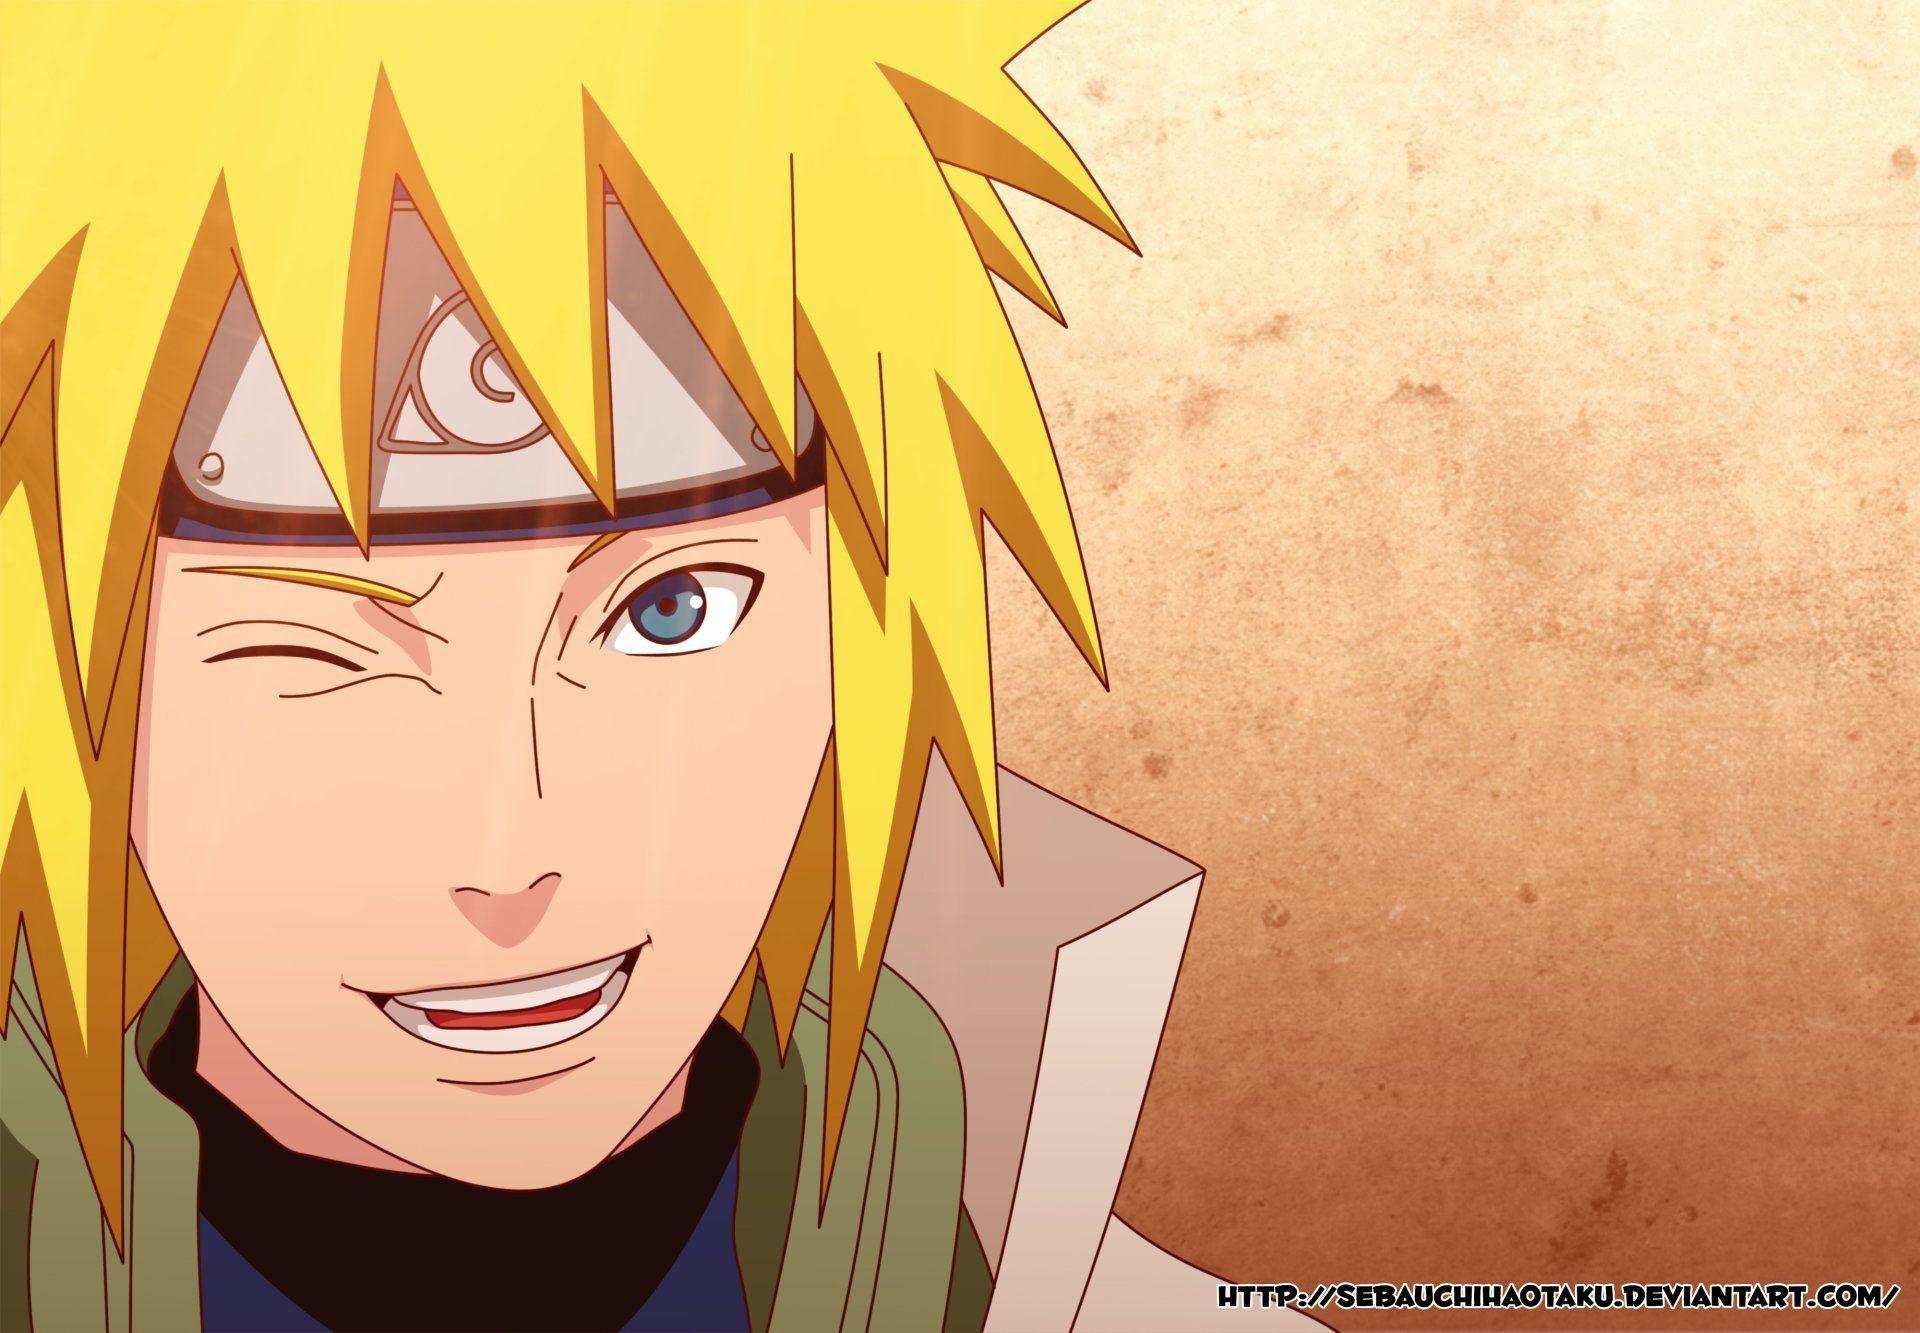 4000x2778 Naruto Wallpaper Background Image. View